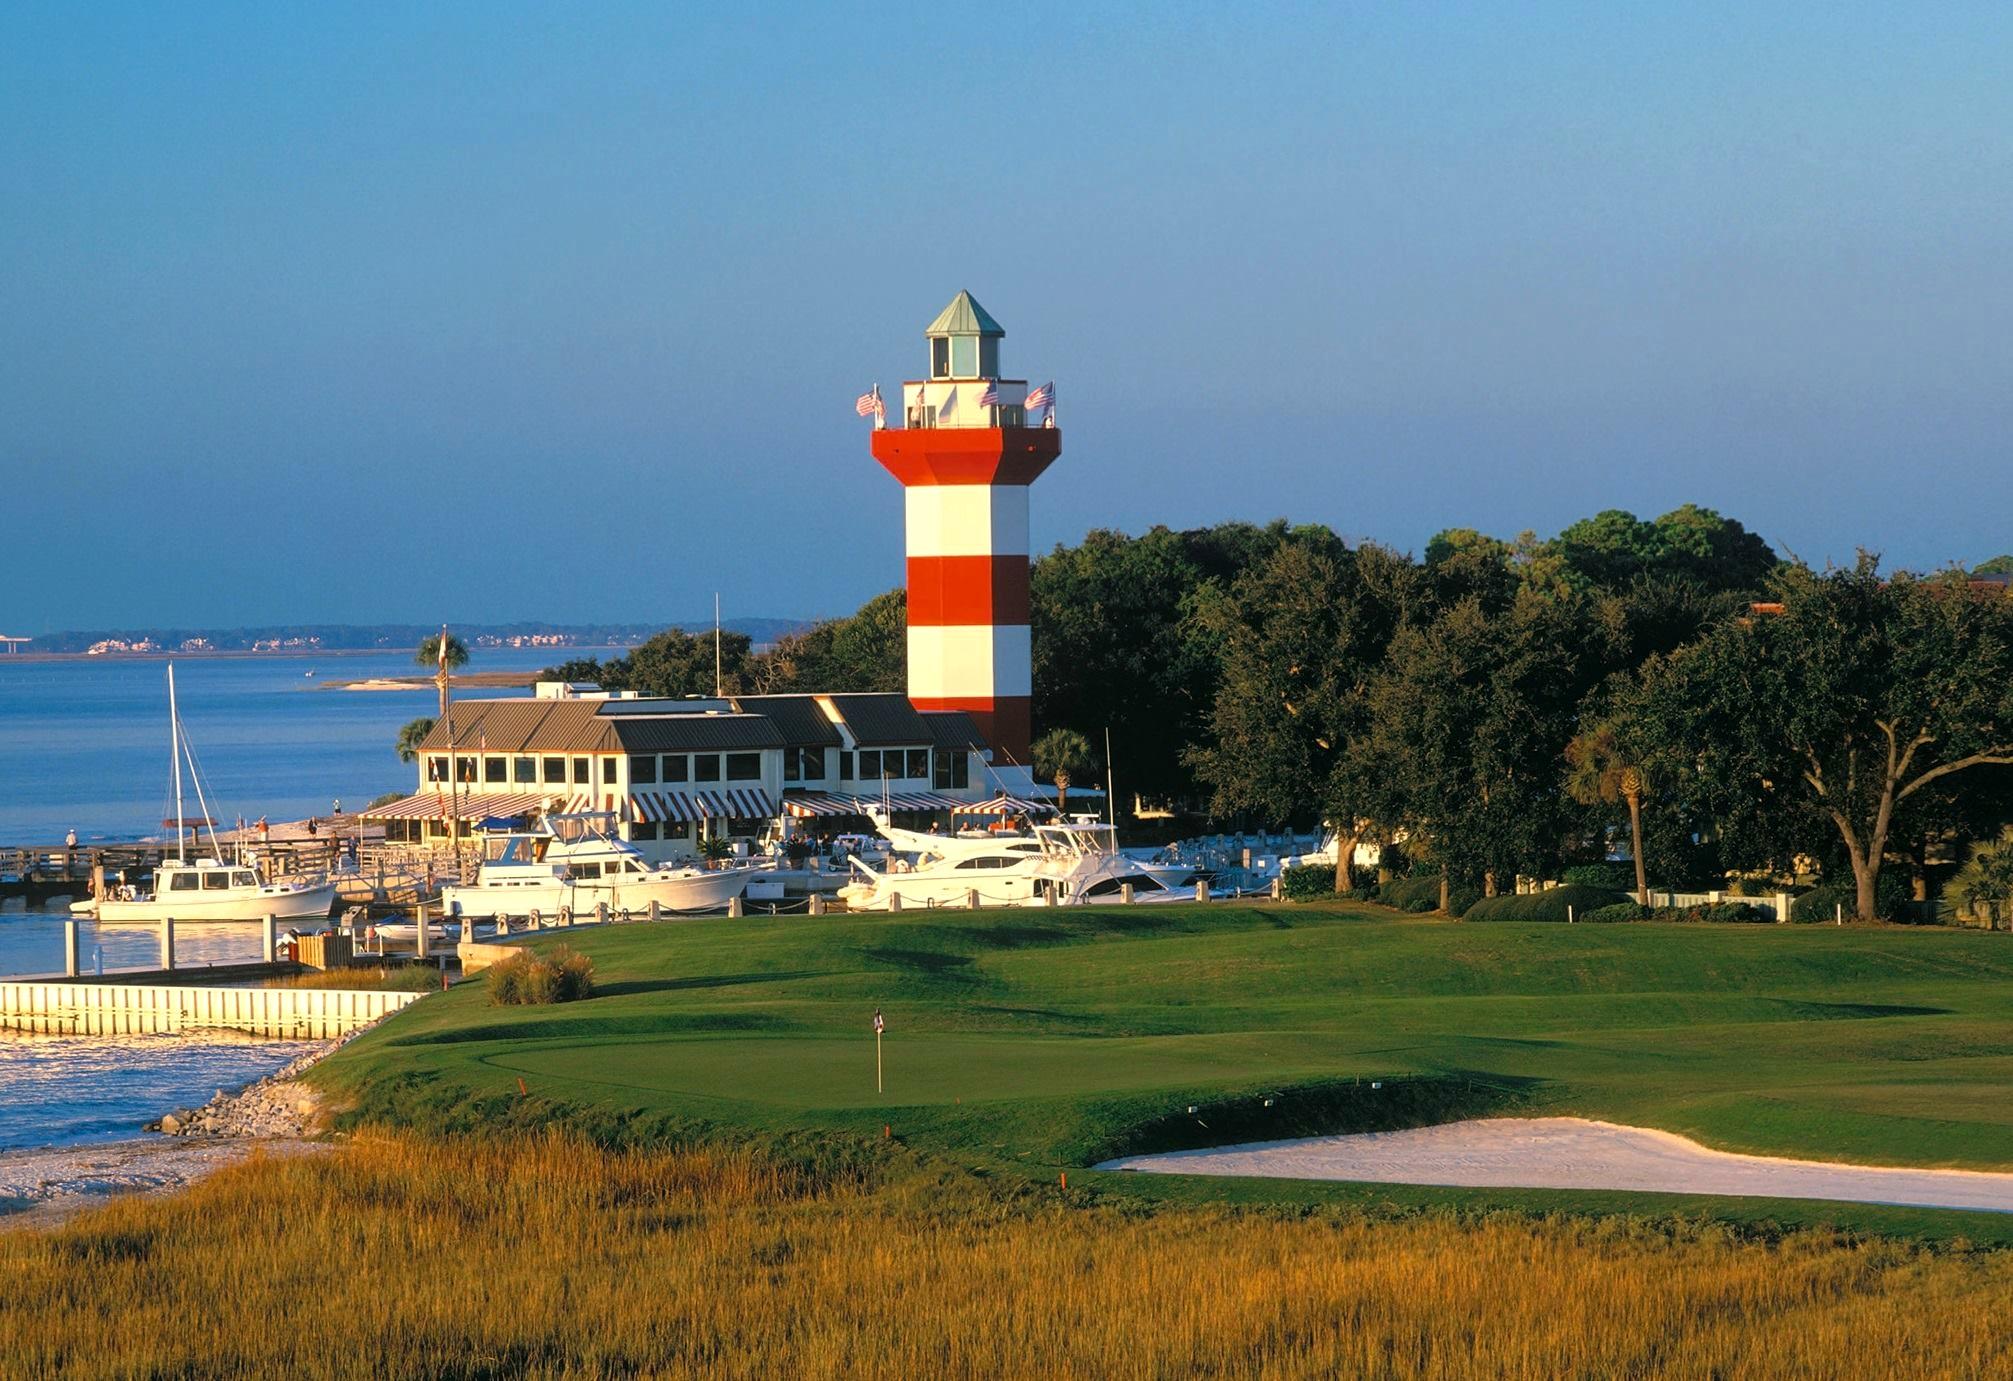 Our home. Beautiful Harbour Town, Sea Pines Resort, Hilton Head Island, South Carolina